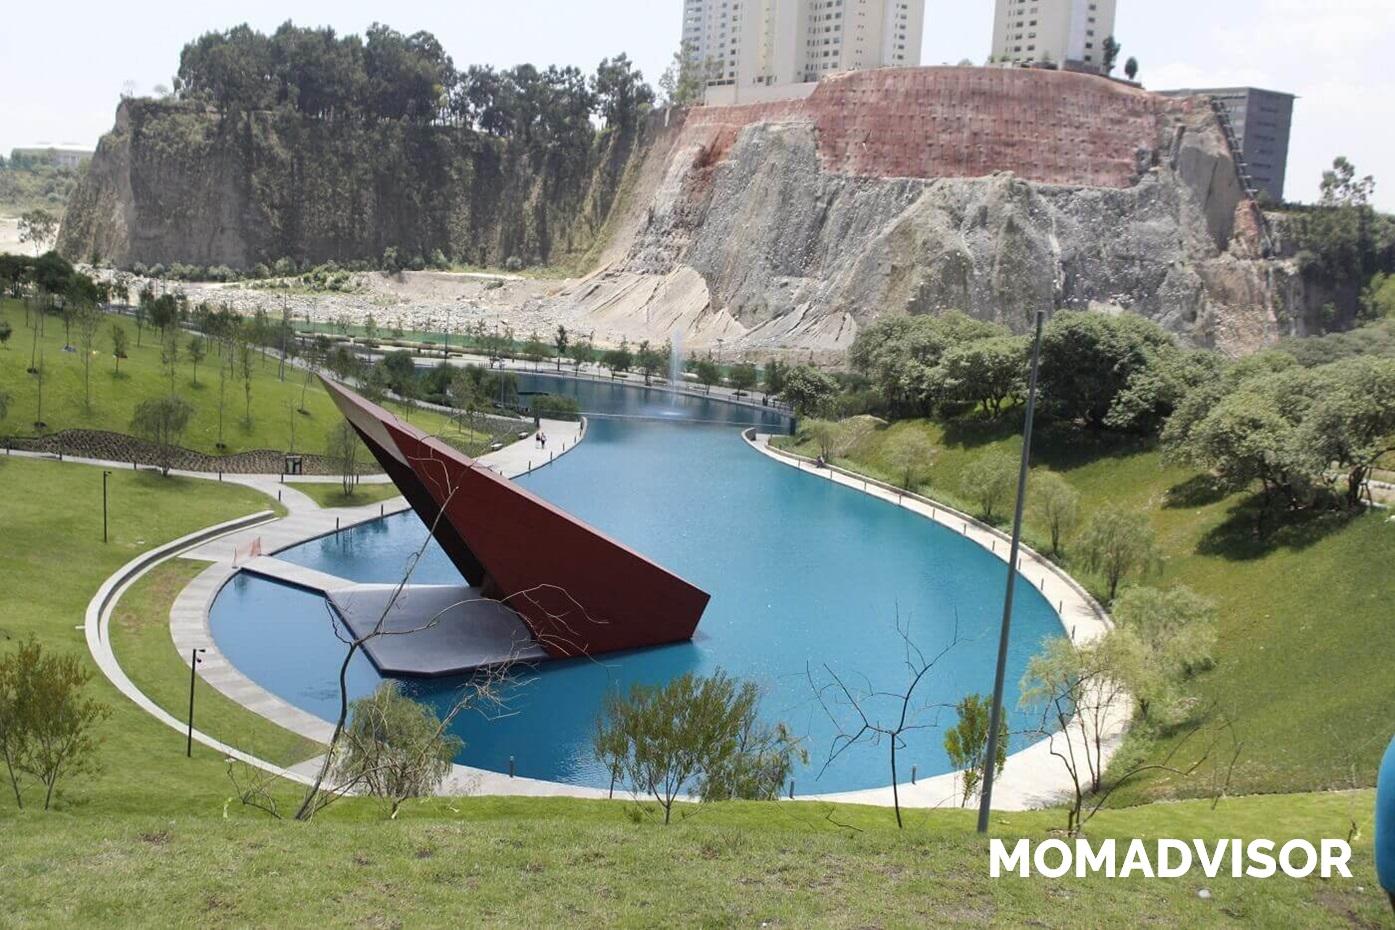 parque-la-mexicana-lago-momadvisor-logo